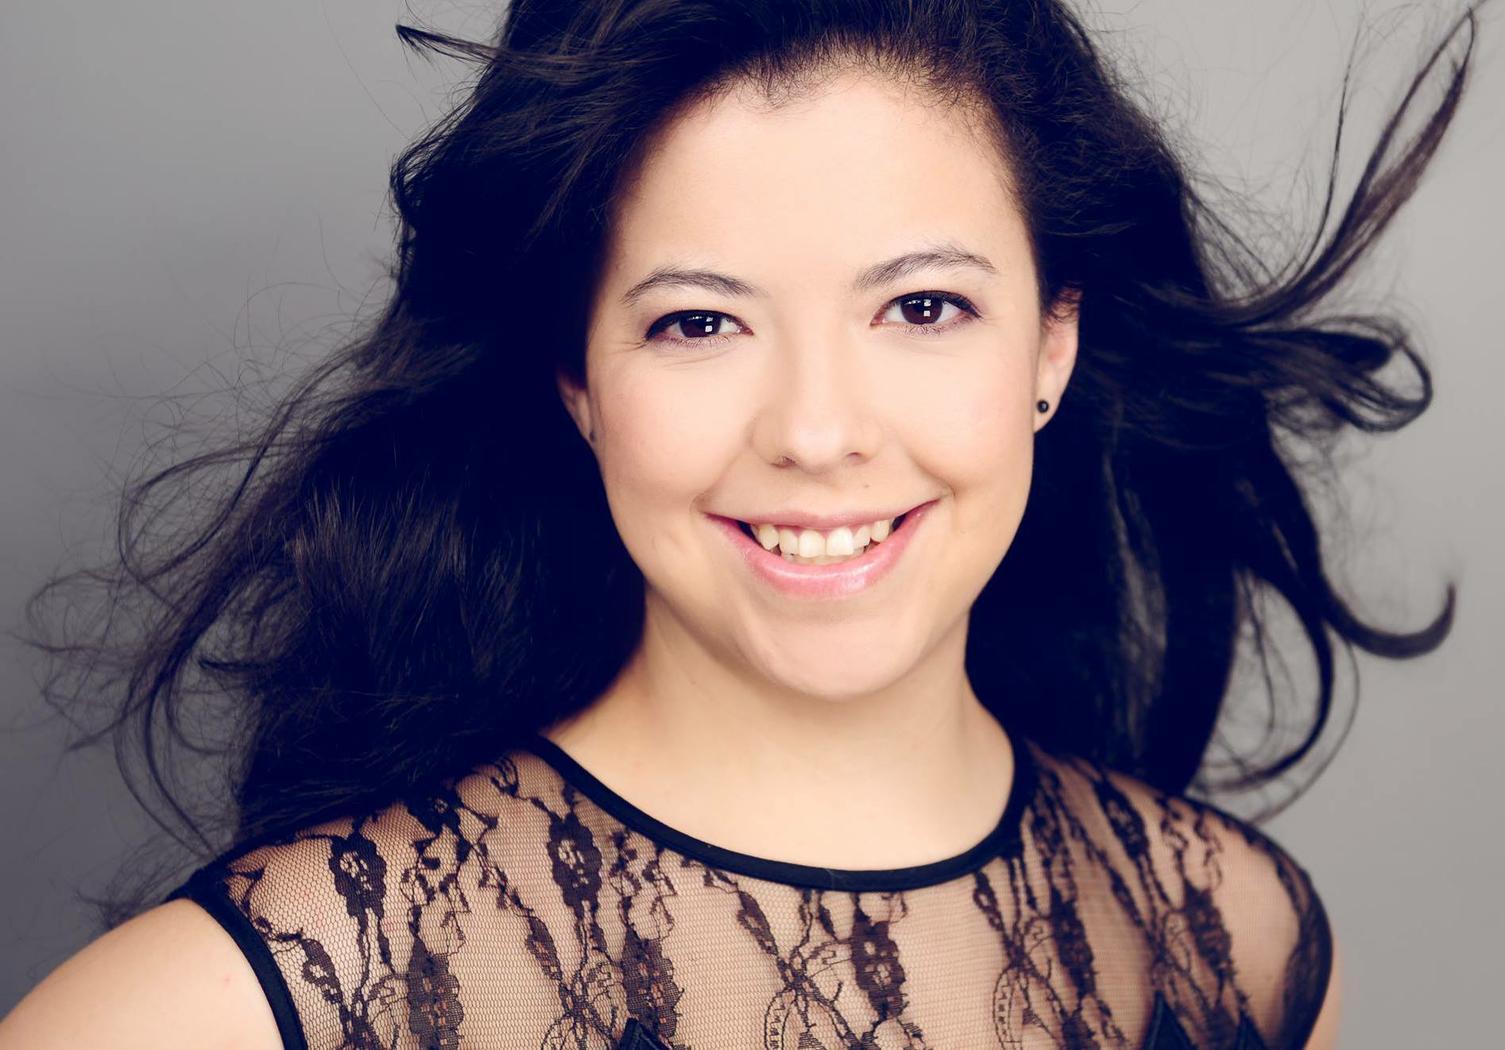 Maria Ocampo